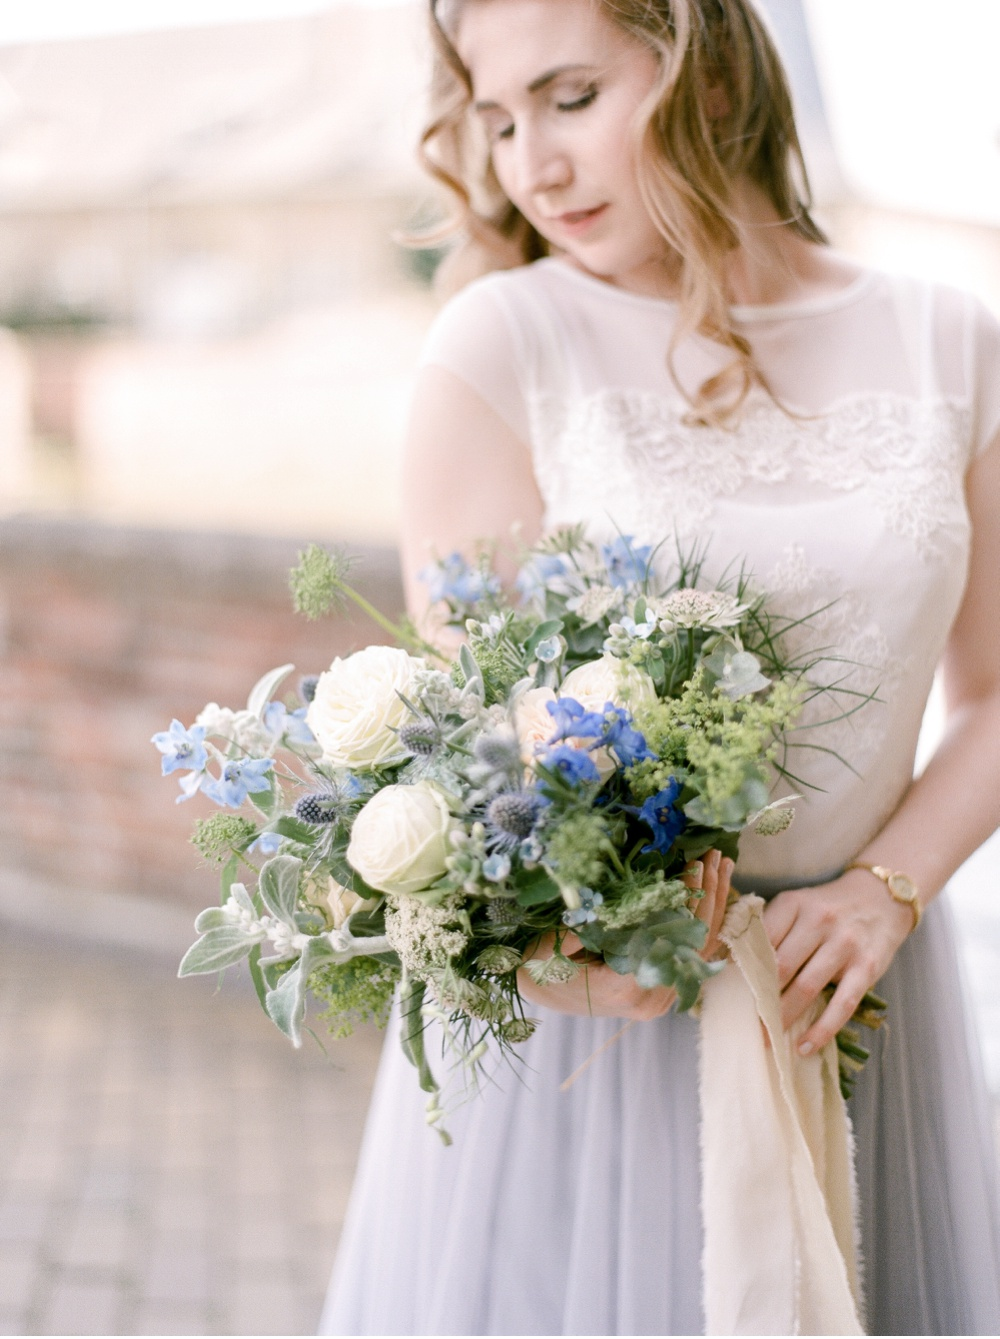 NRW_Hochzeitsfotograf©MadalinaSheldon_0003.jpg